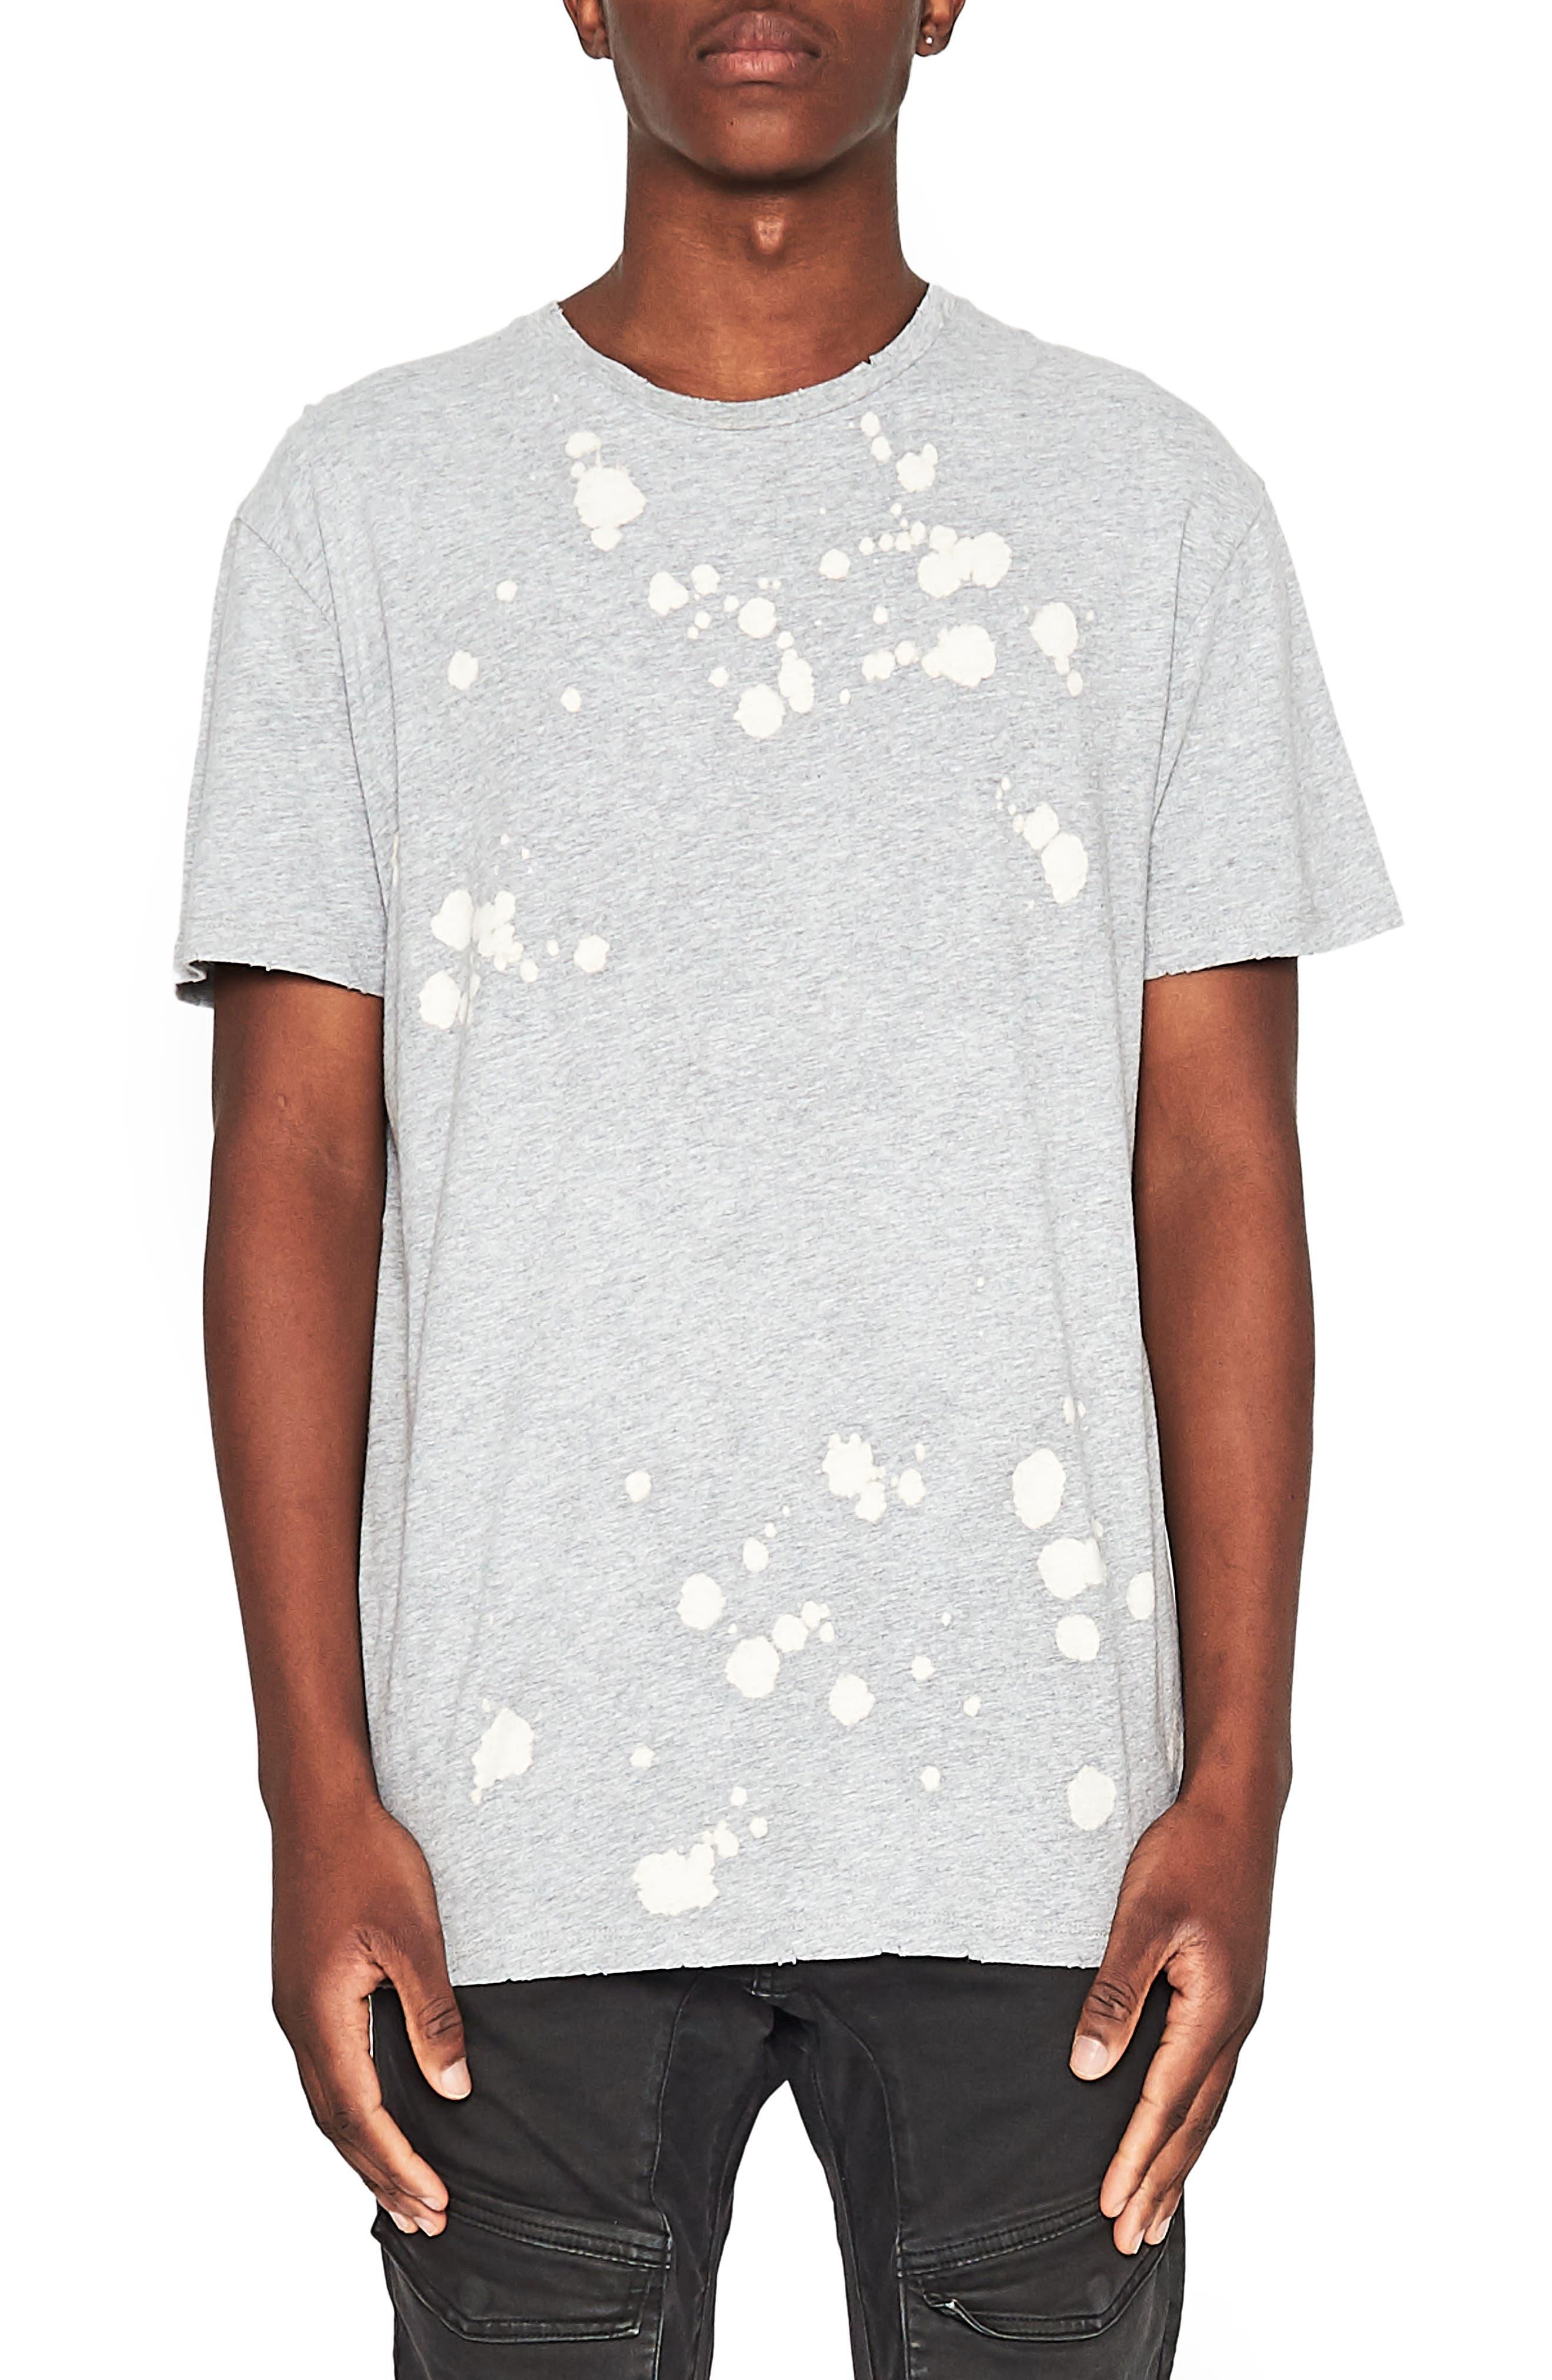 Alternate Image 1 Selected - NXP Da Vinci T-Shirt